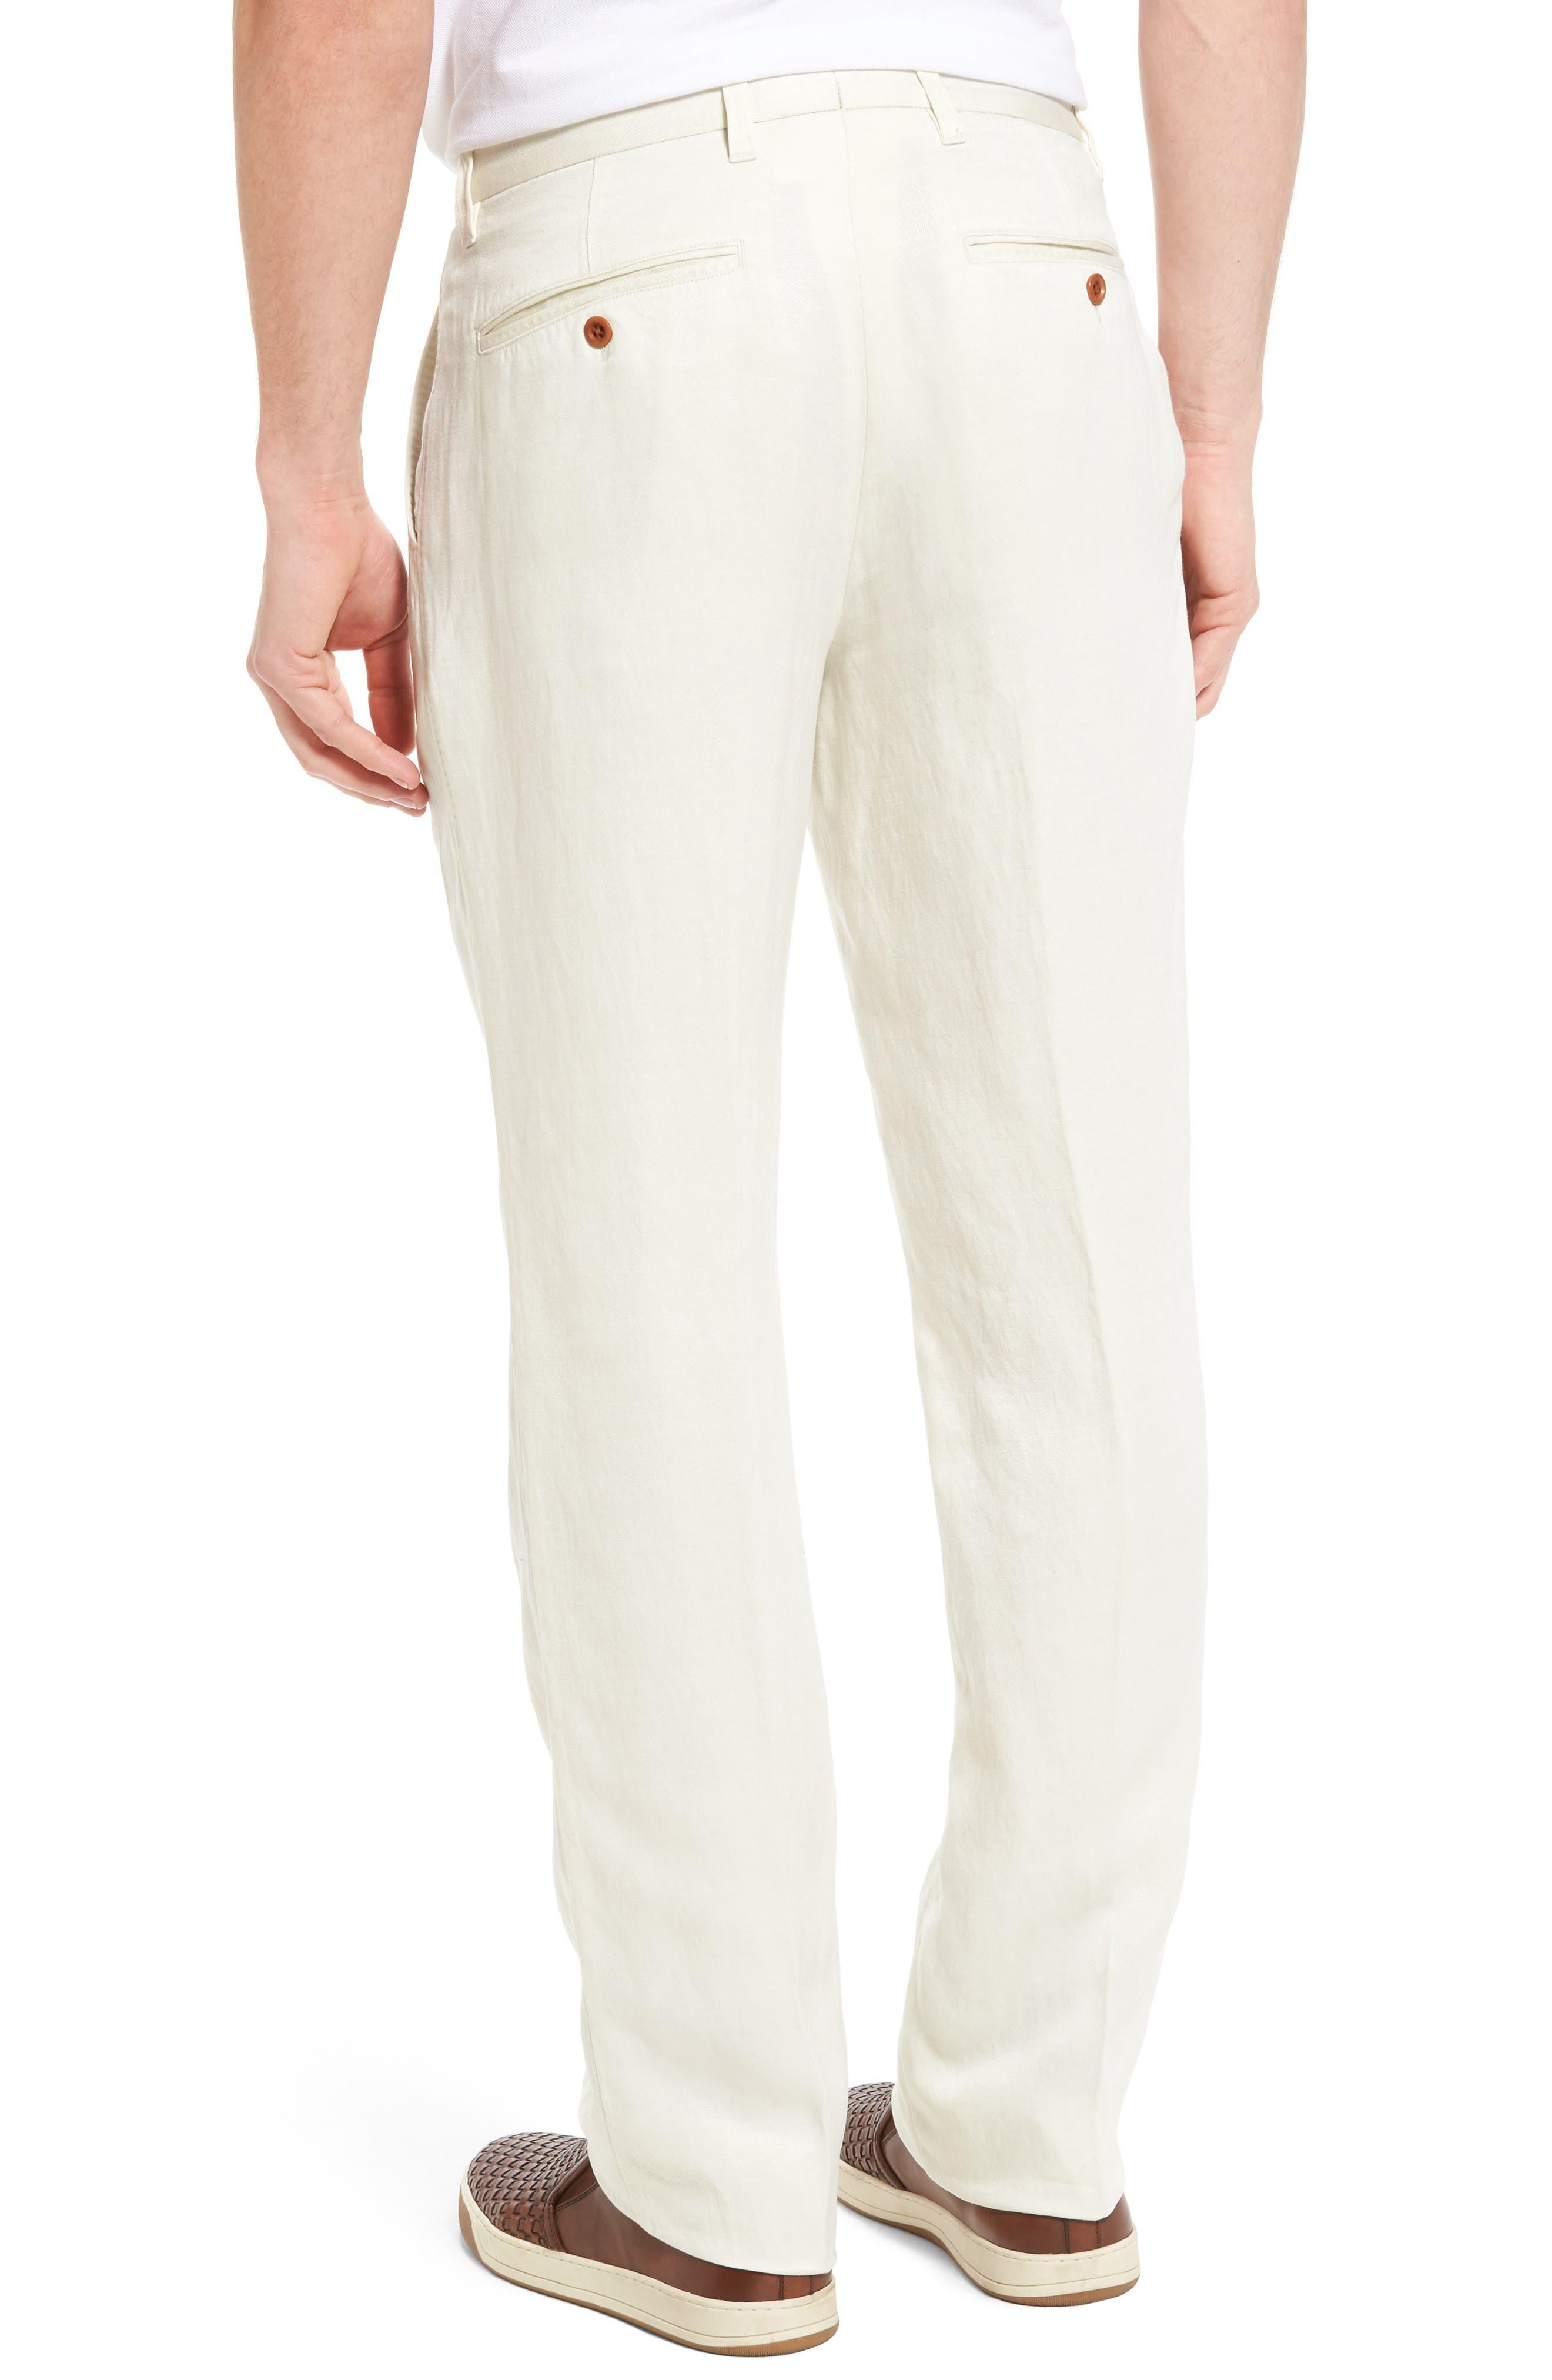 'La Jolla' Flat Front Pants,                             Alternate thumbnail 2, color,                             250